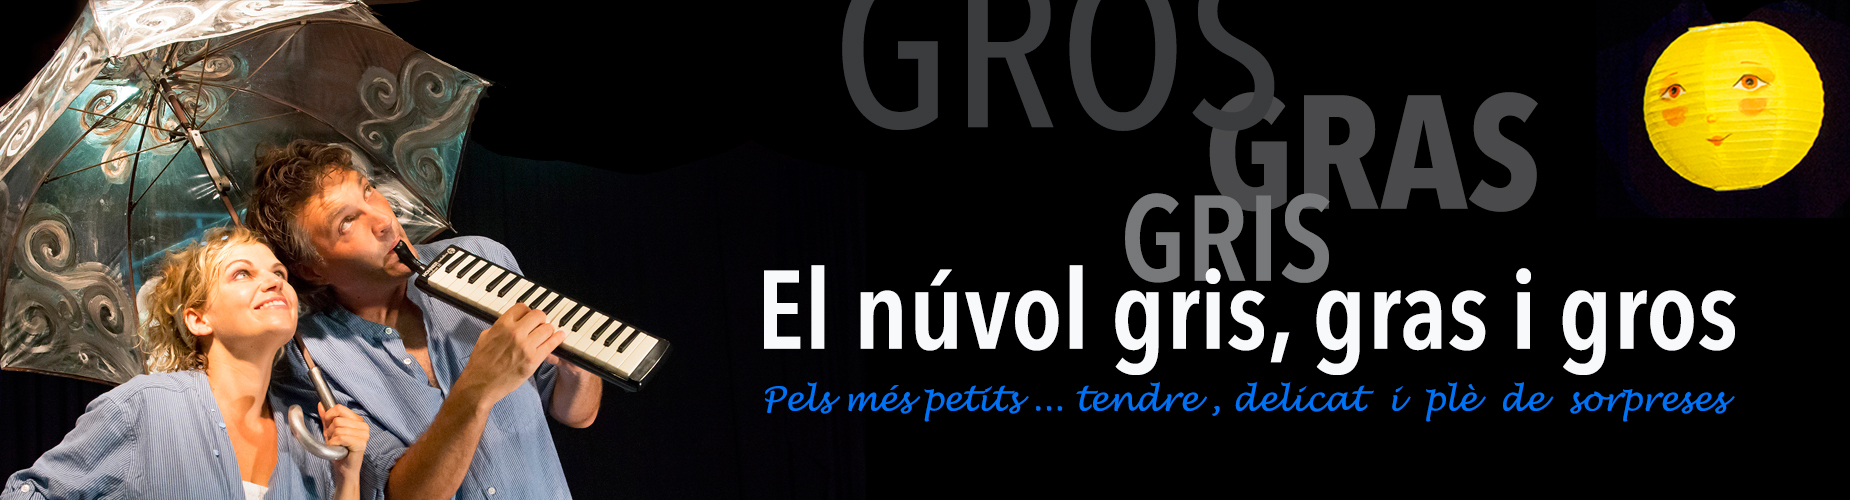 EL NÚVOL GRIS, GRAS I GROS